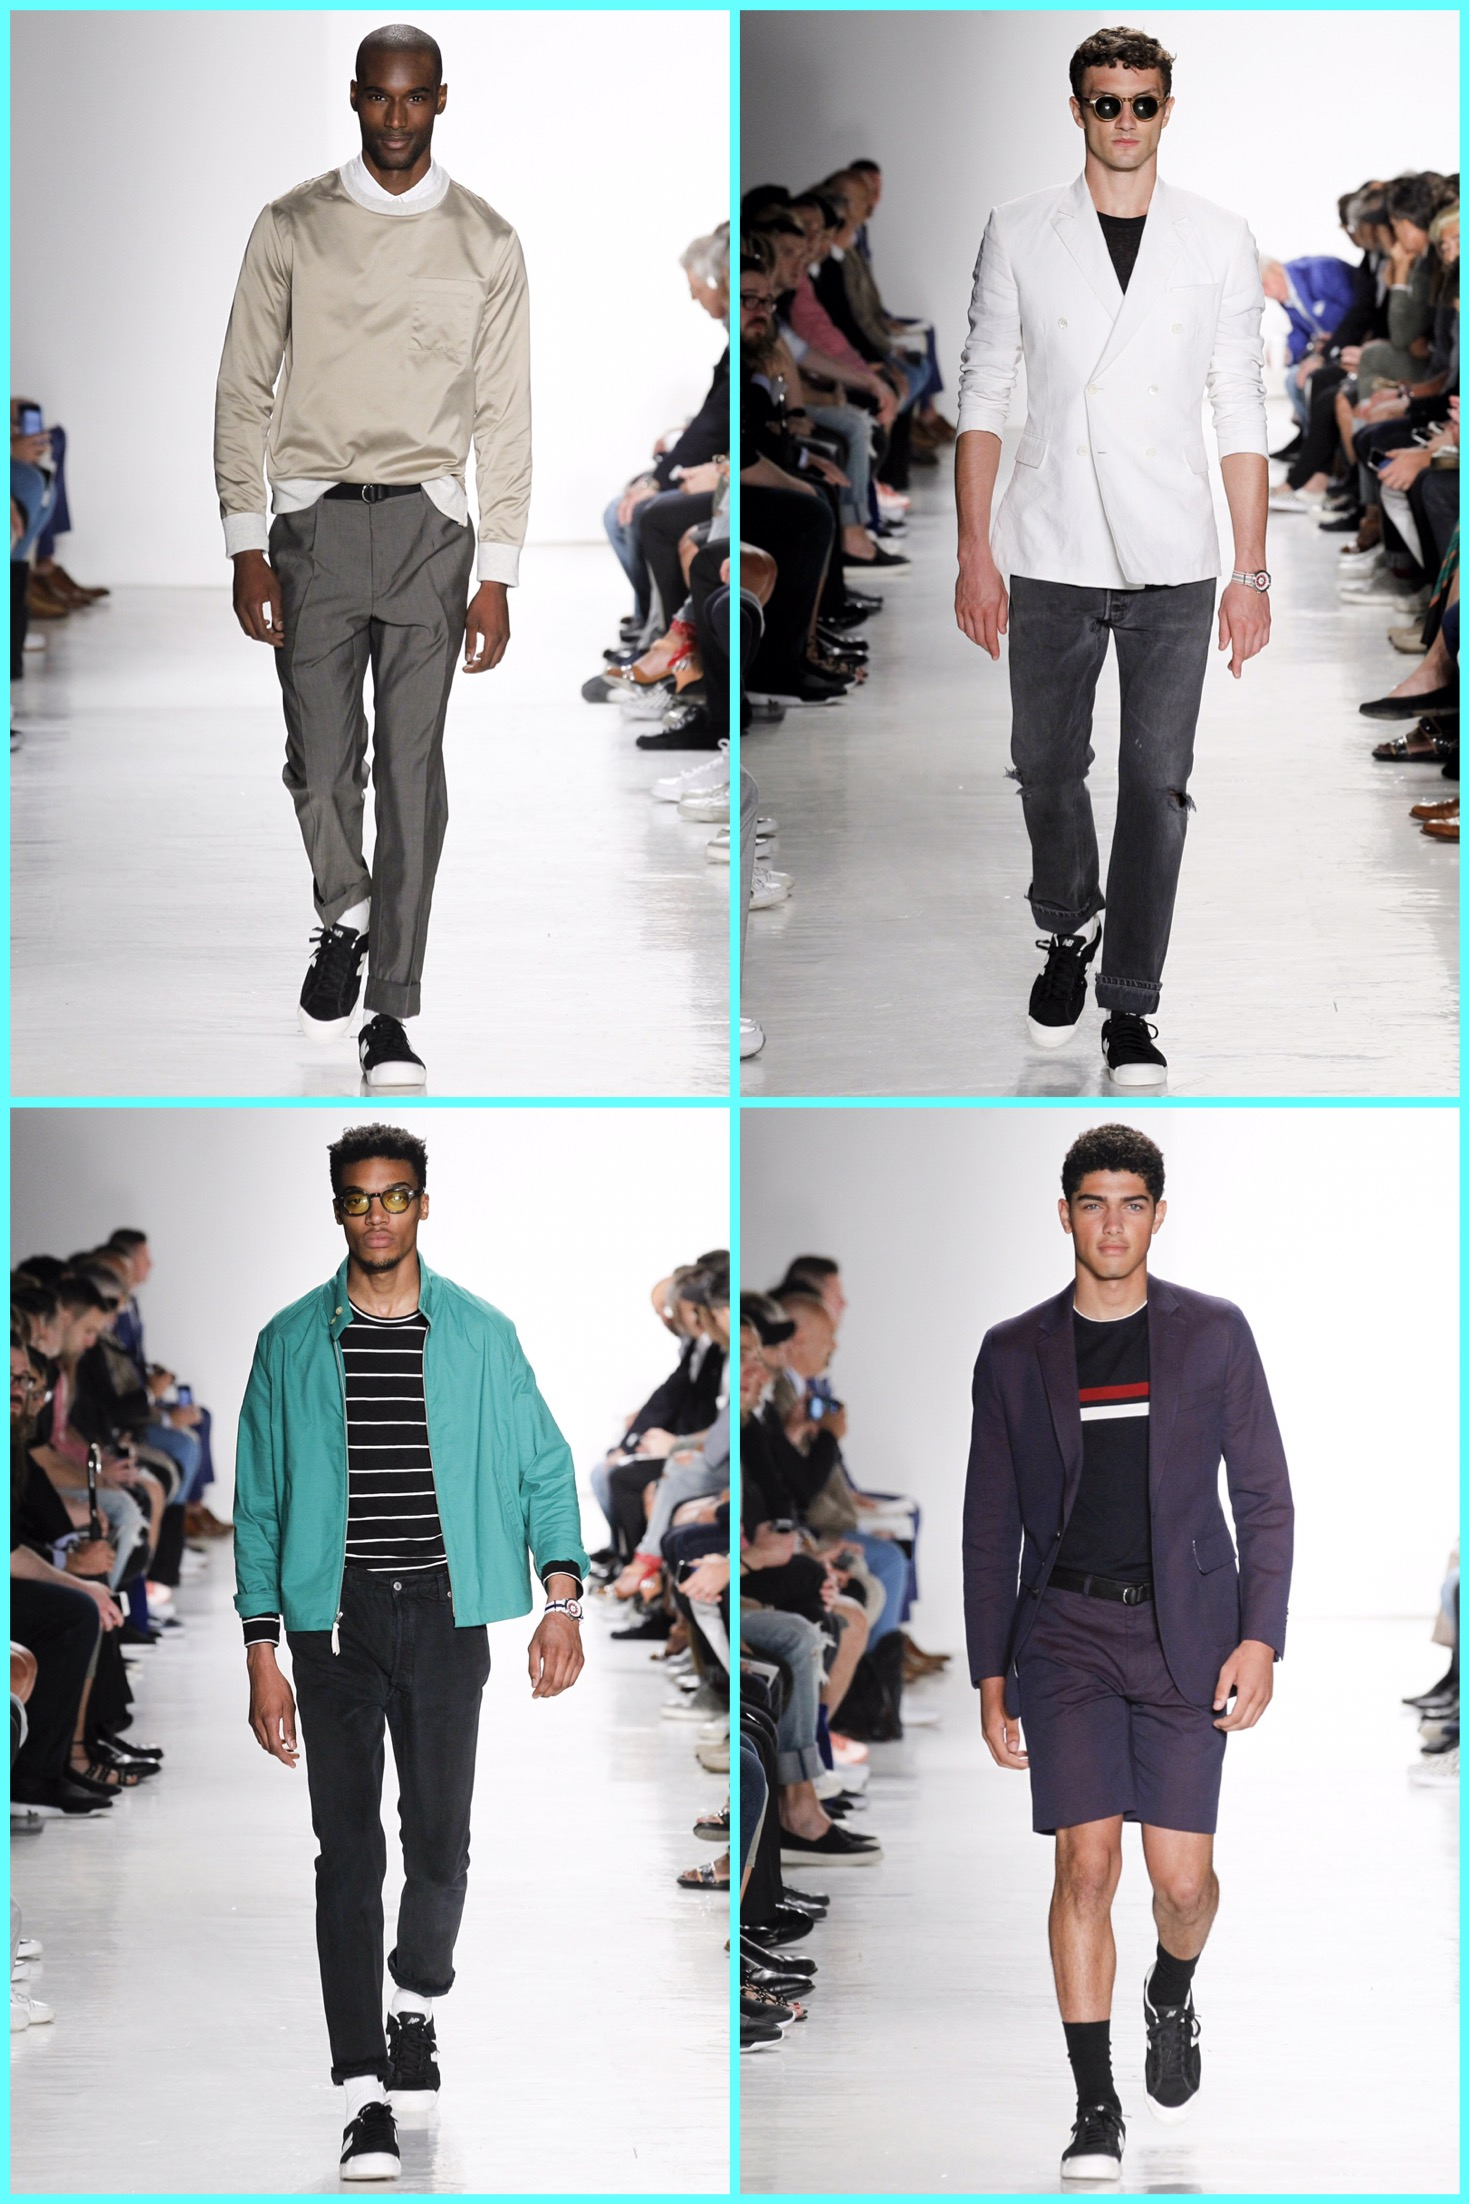 ny-fashion-week-menswear-spring-summer-2017-style-todd-snyder